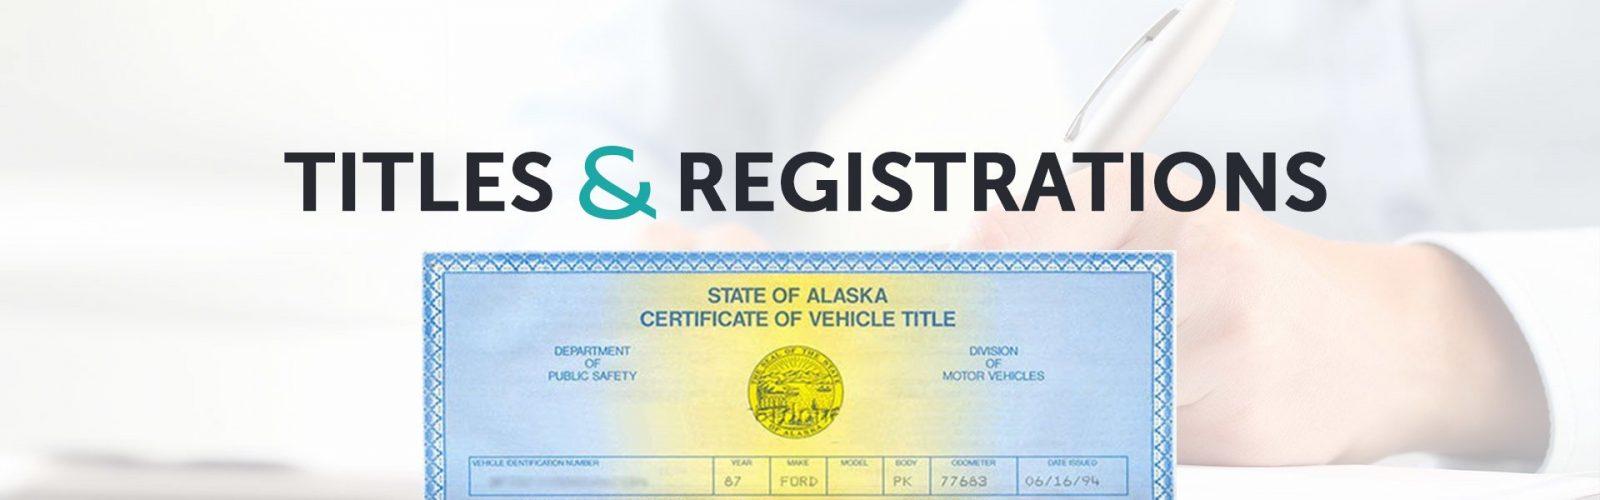 titles-registrations